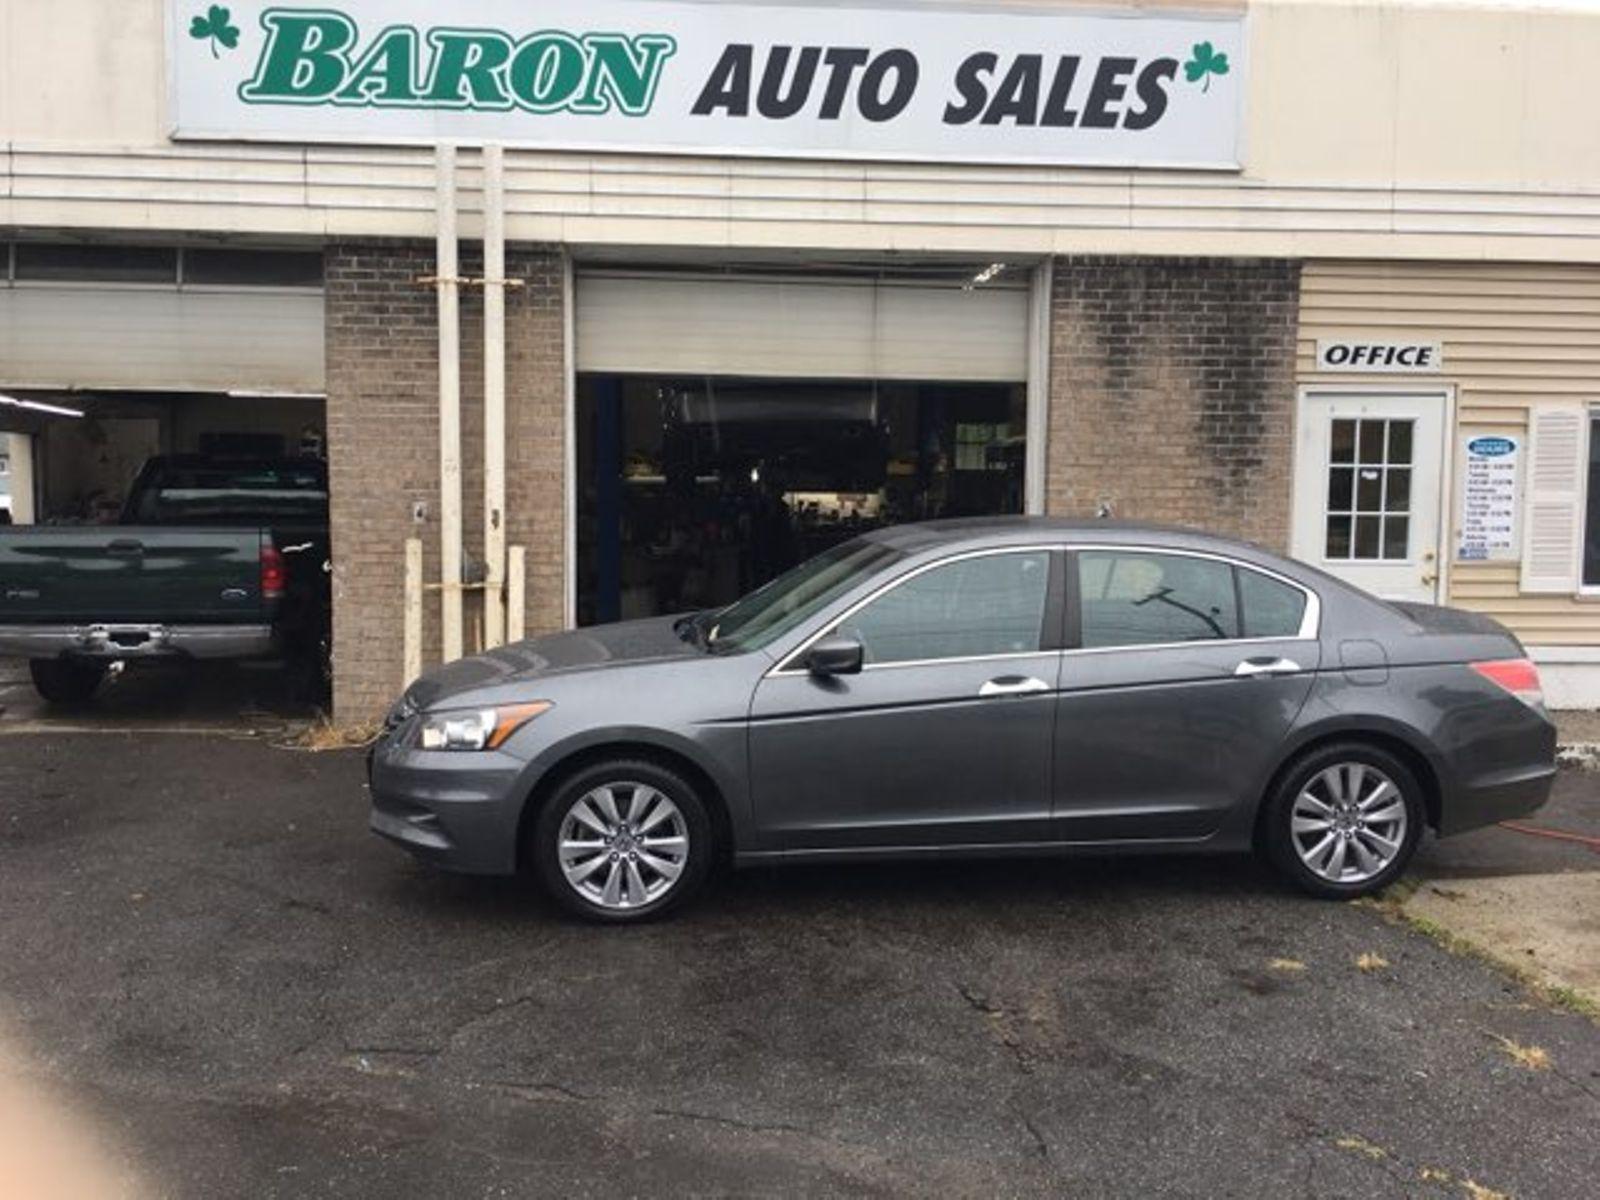 2012 Honda Accord EX L City MA Baron Auto Sales In West Springfield, ...